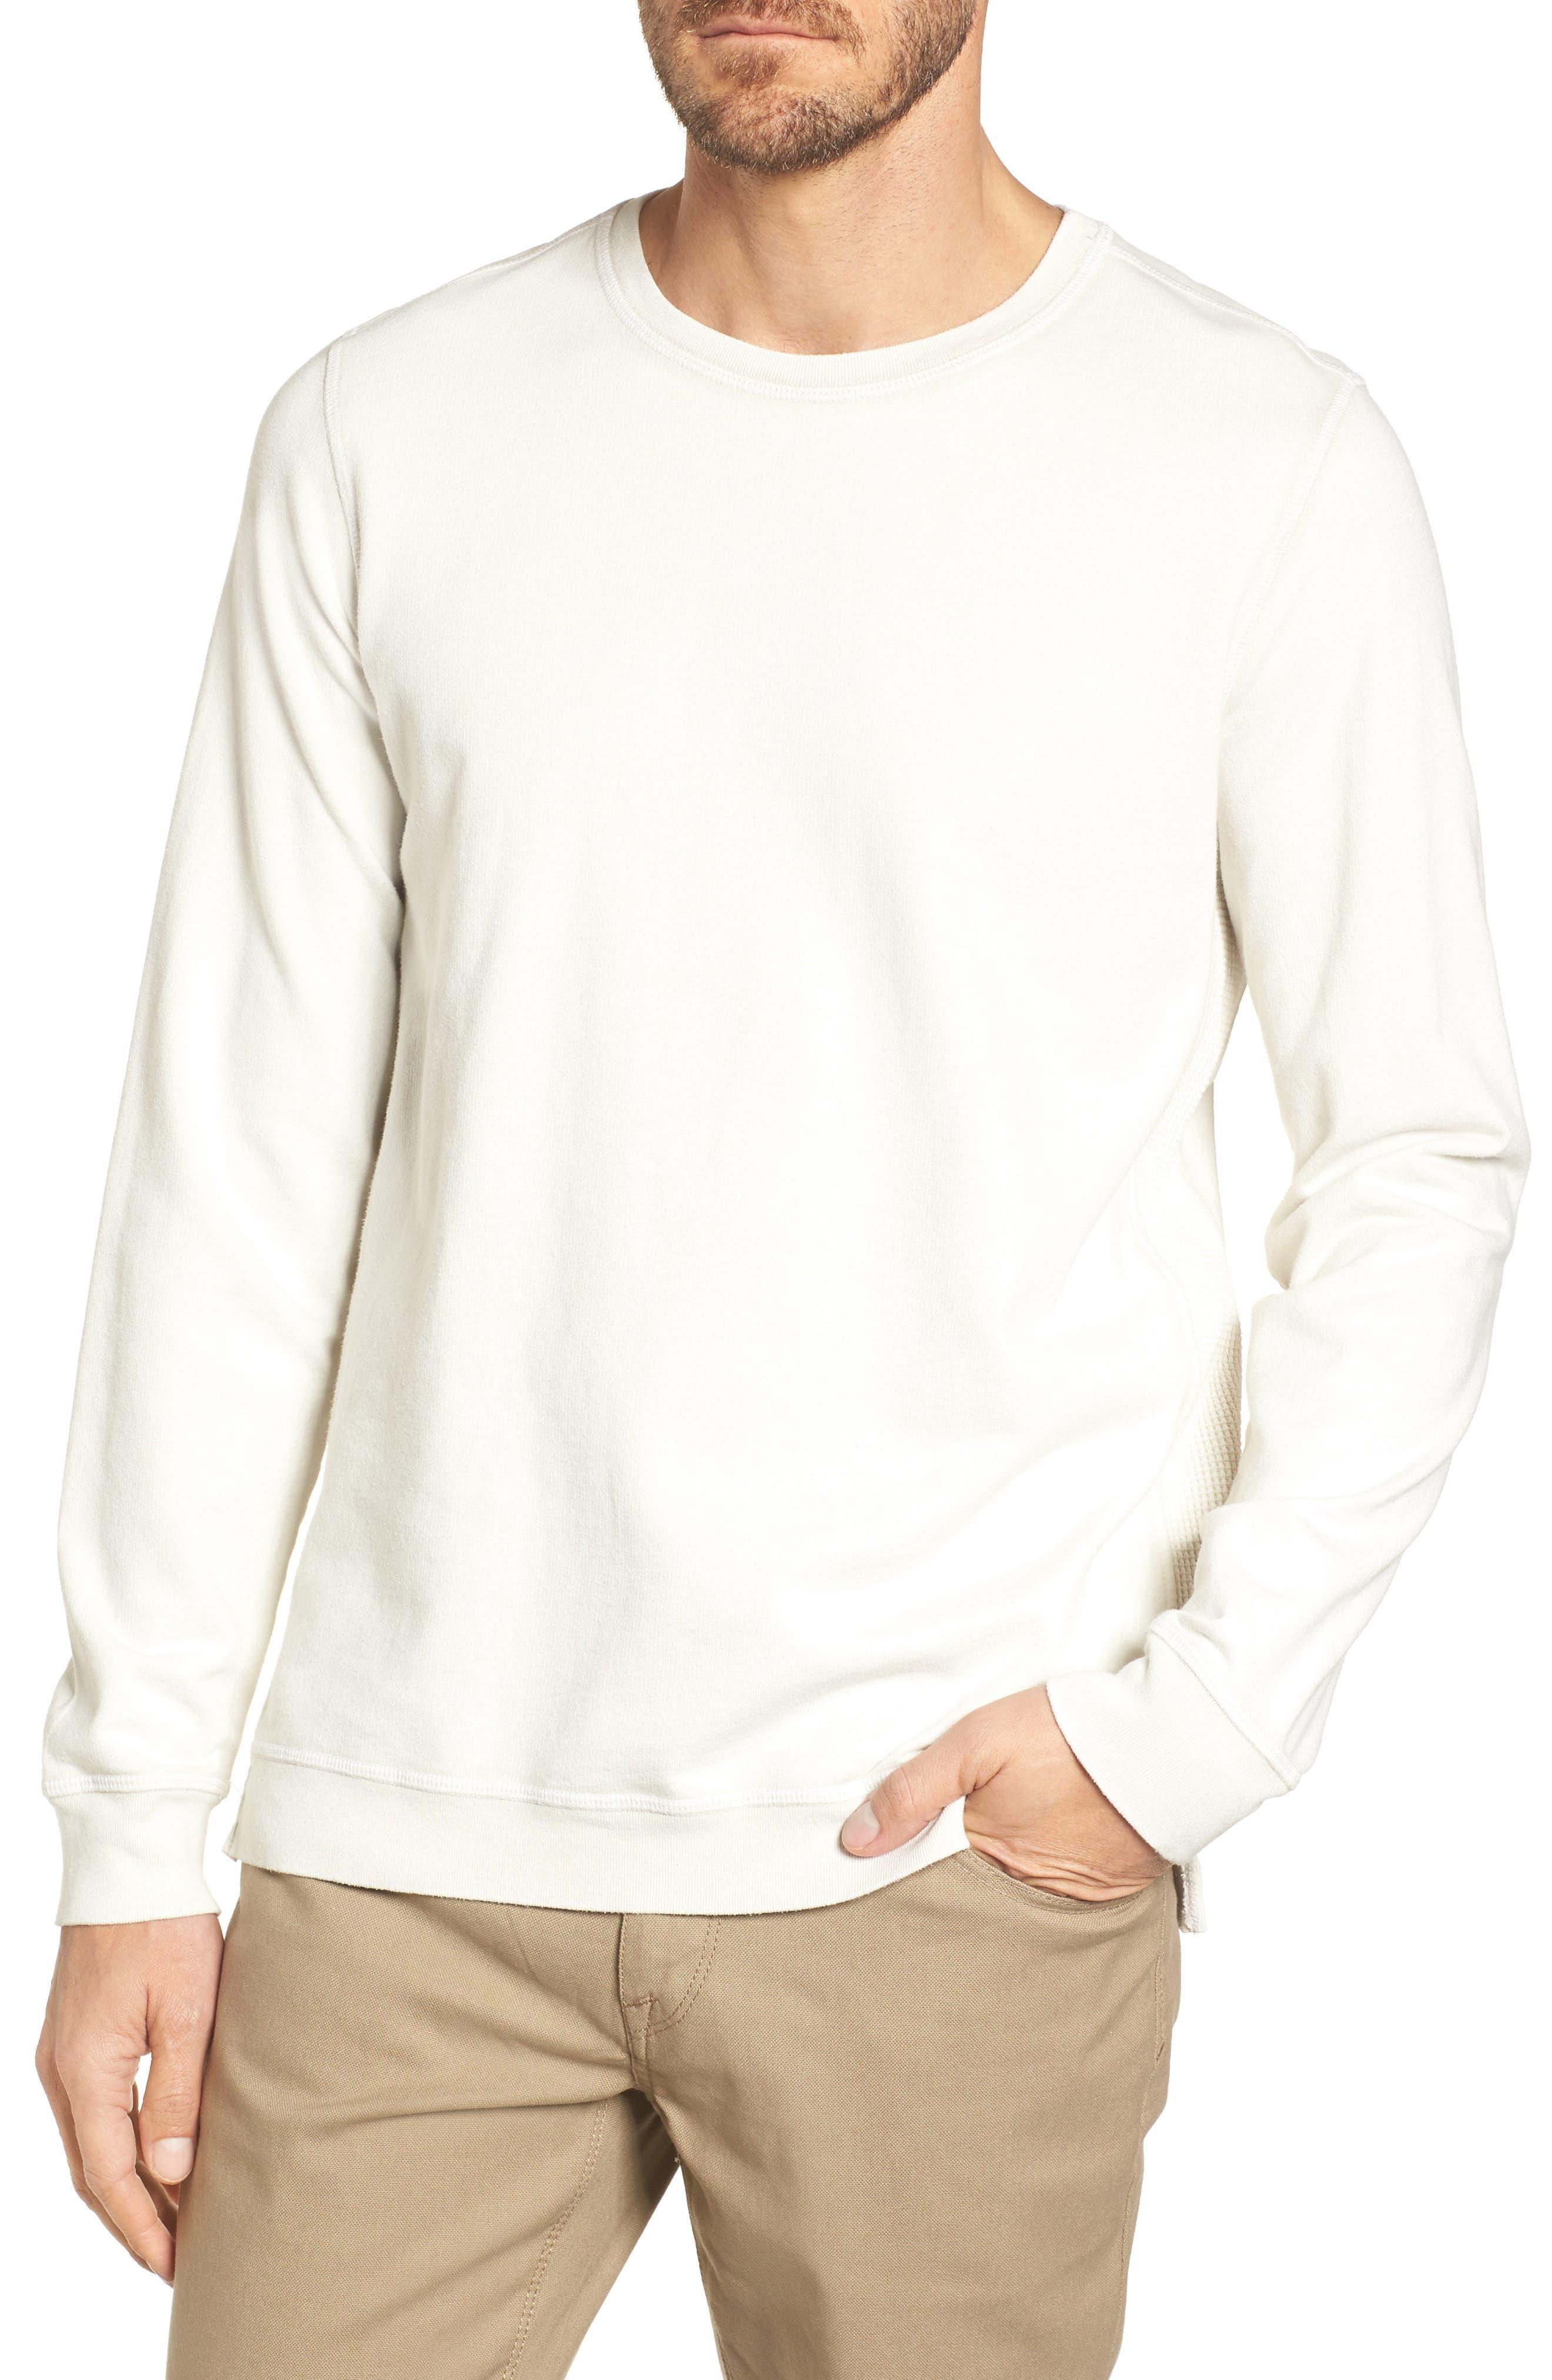 Max Slim Long Sleeve T-Shirt,                         Main,                         color,